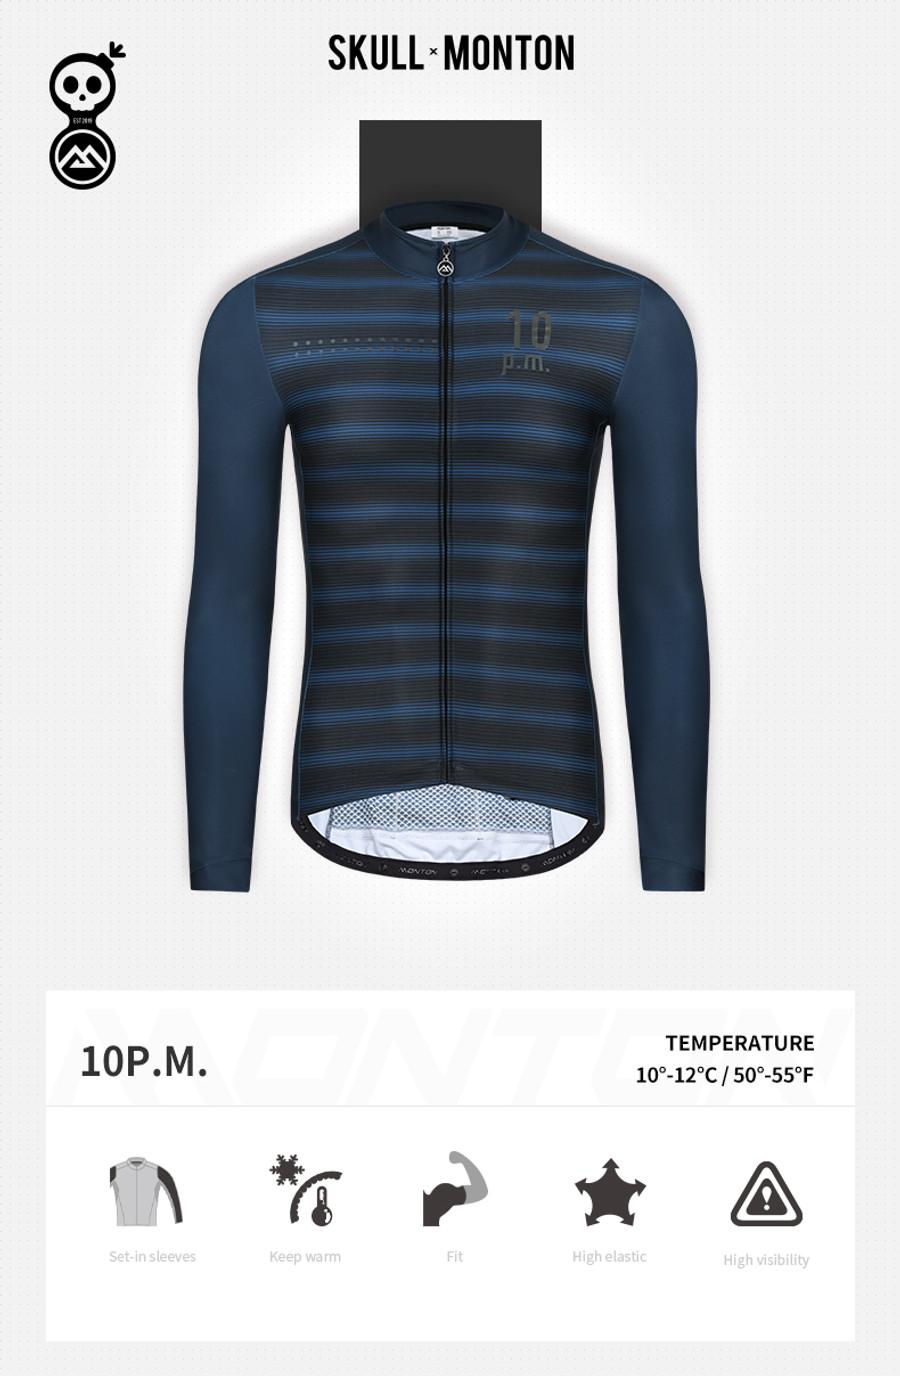 Men's Urban+ 10 p.m. Thermal l/s Jersey